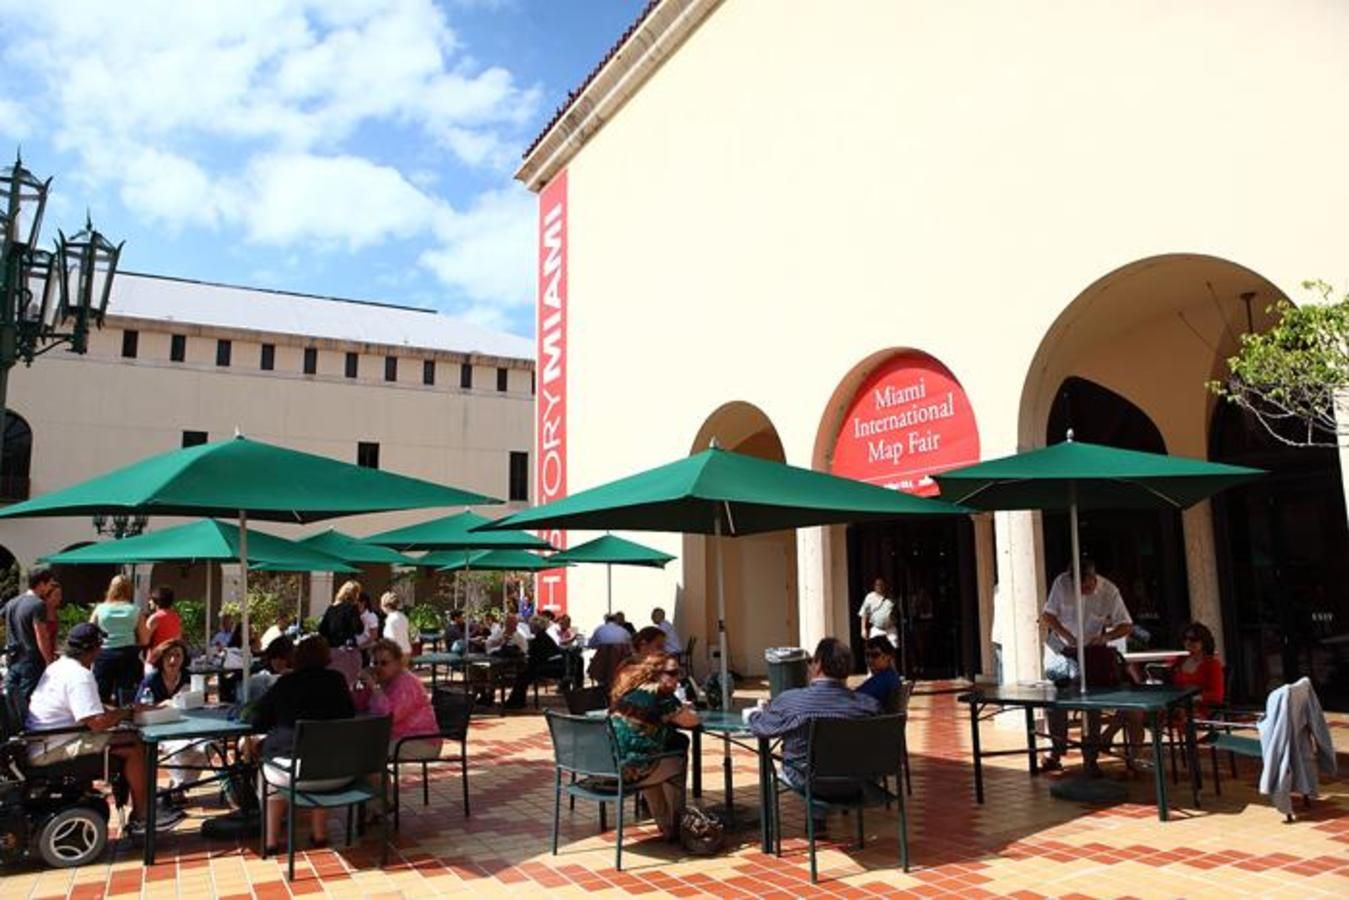 Plaza culturelle